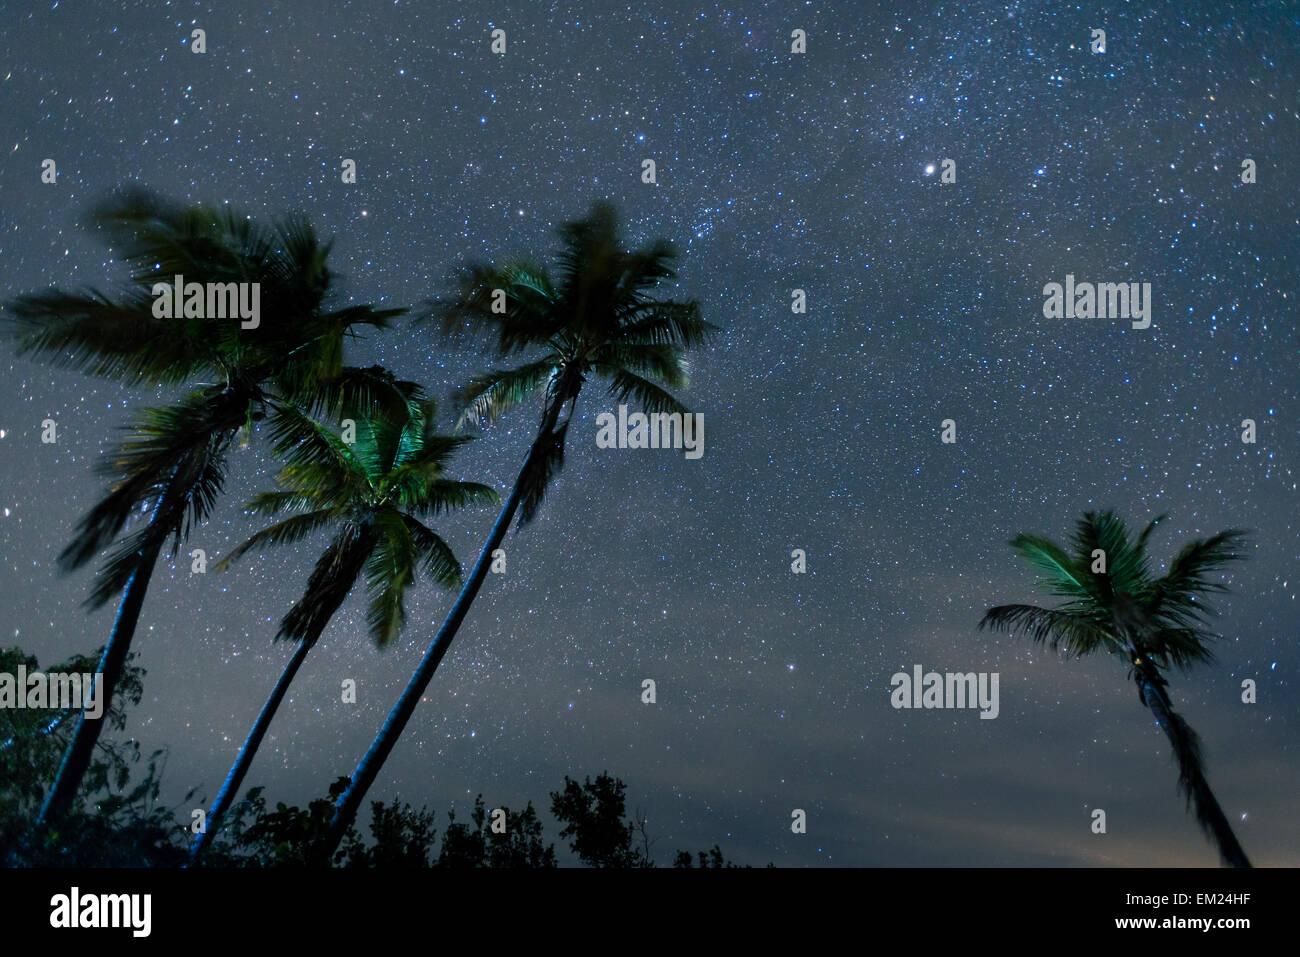 Stars in night sky appear above palm trees, Bahia Honda State Park, Bahia Honda Key, Florida. - Stock Image